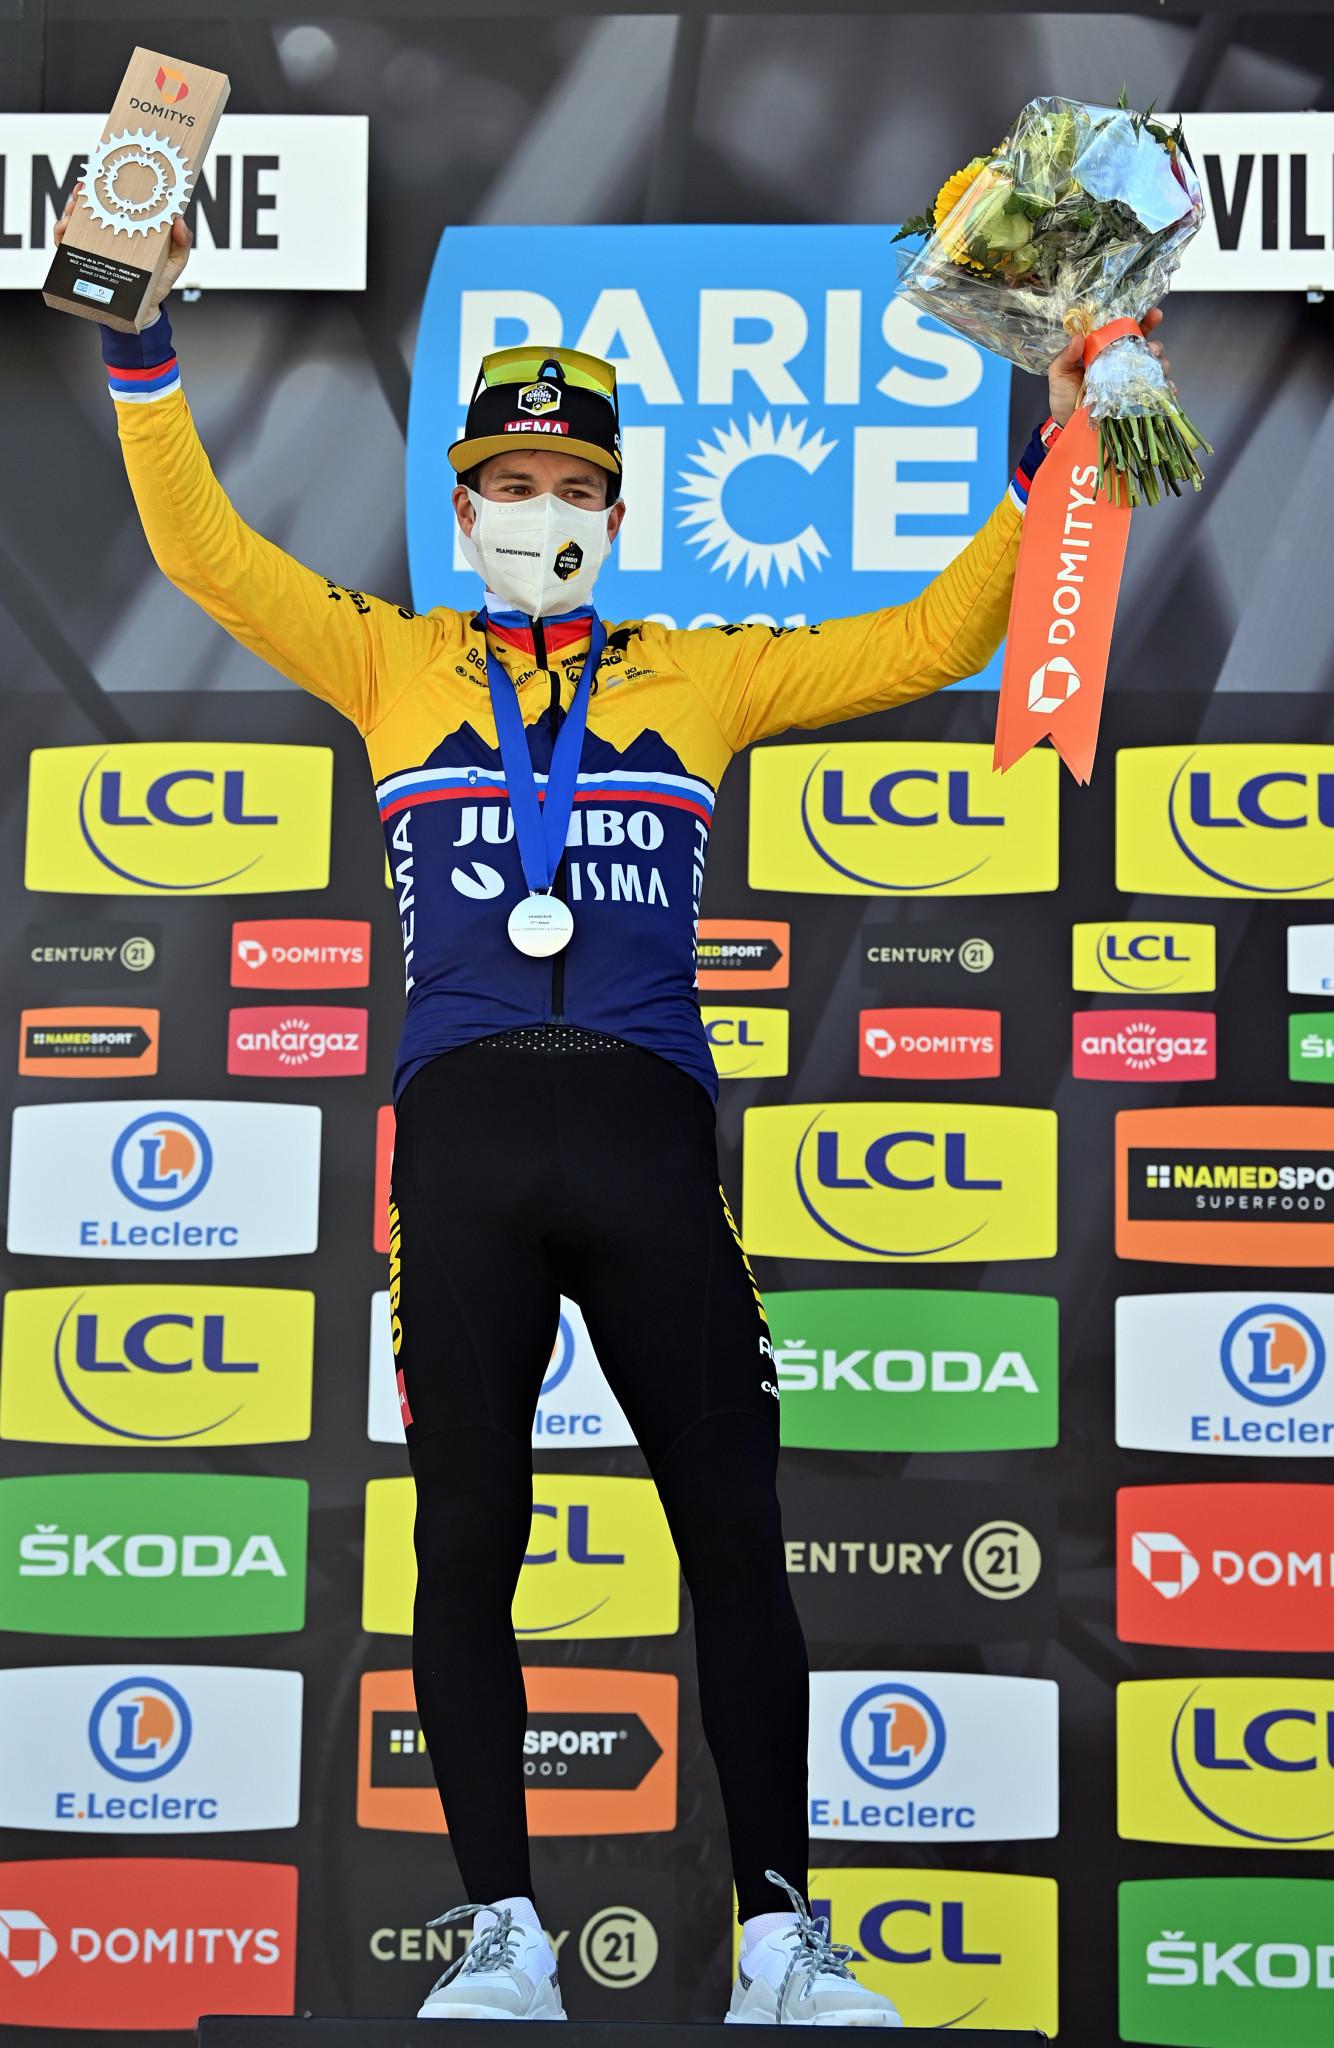 Roglič closes in on Paris-Nice crown after winning penultimate stage